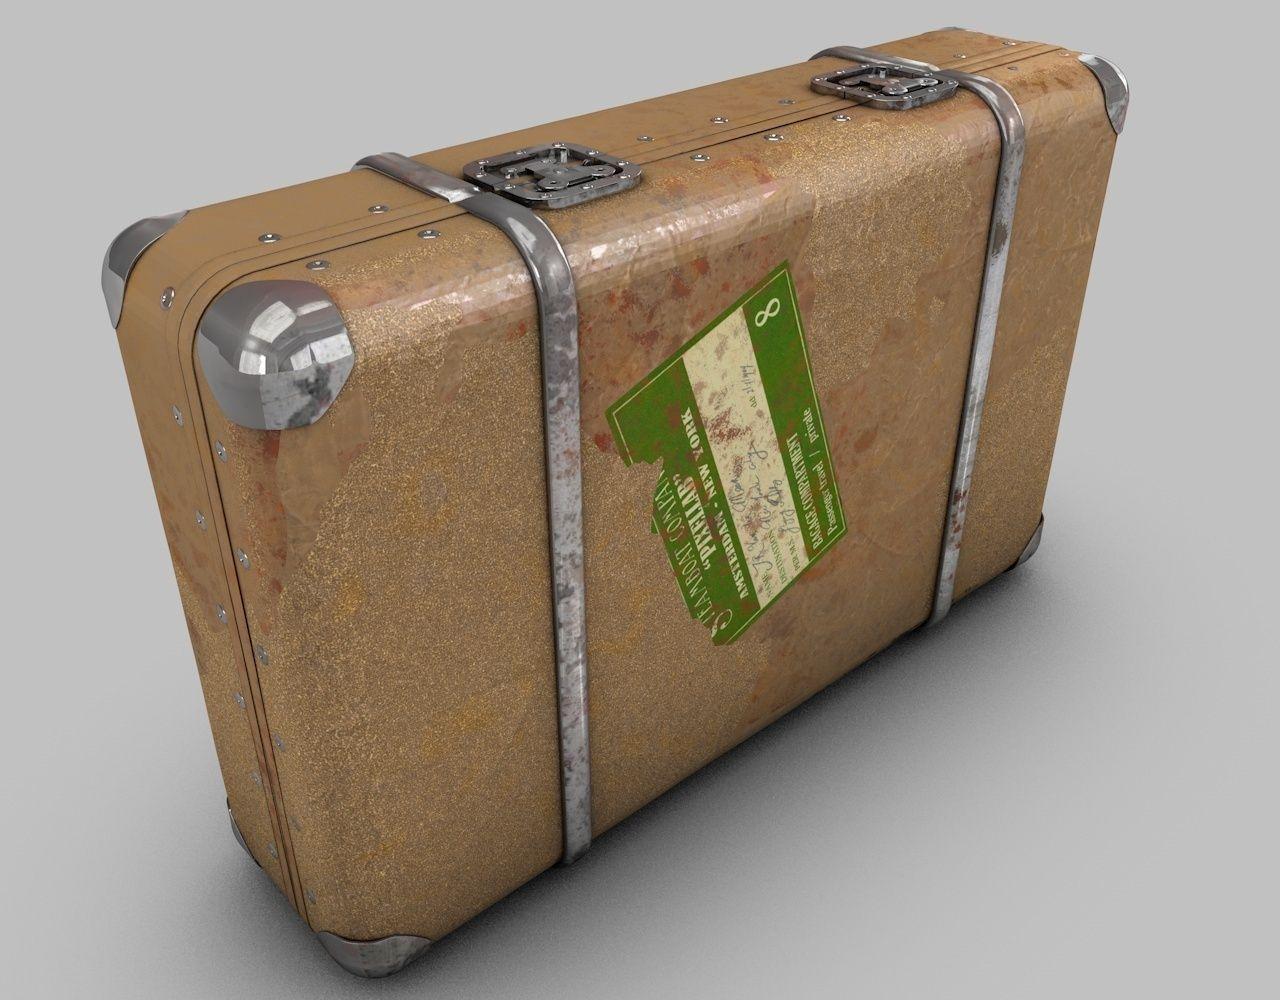 vintage old suitcase 3d model cgtrader